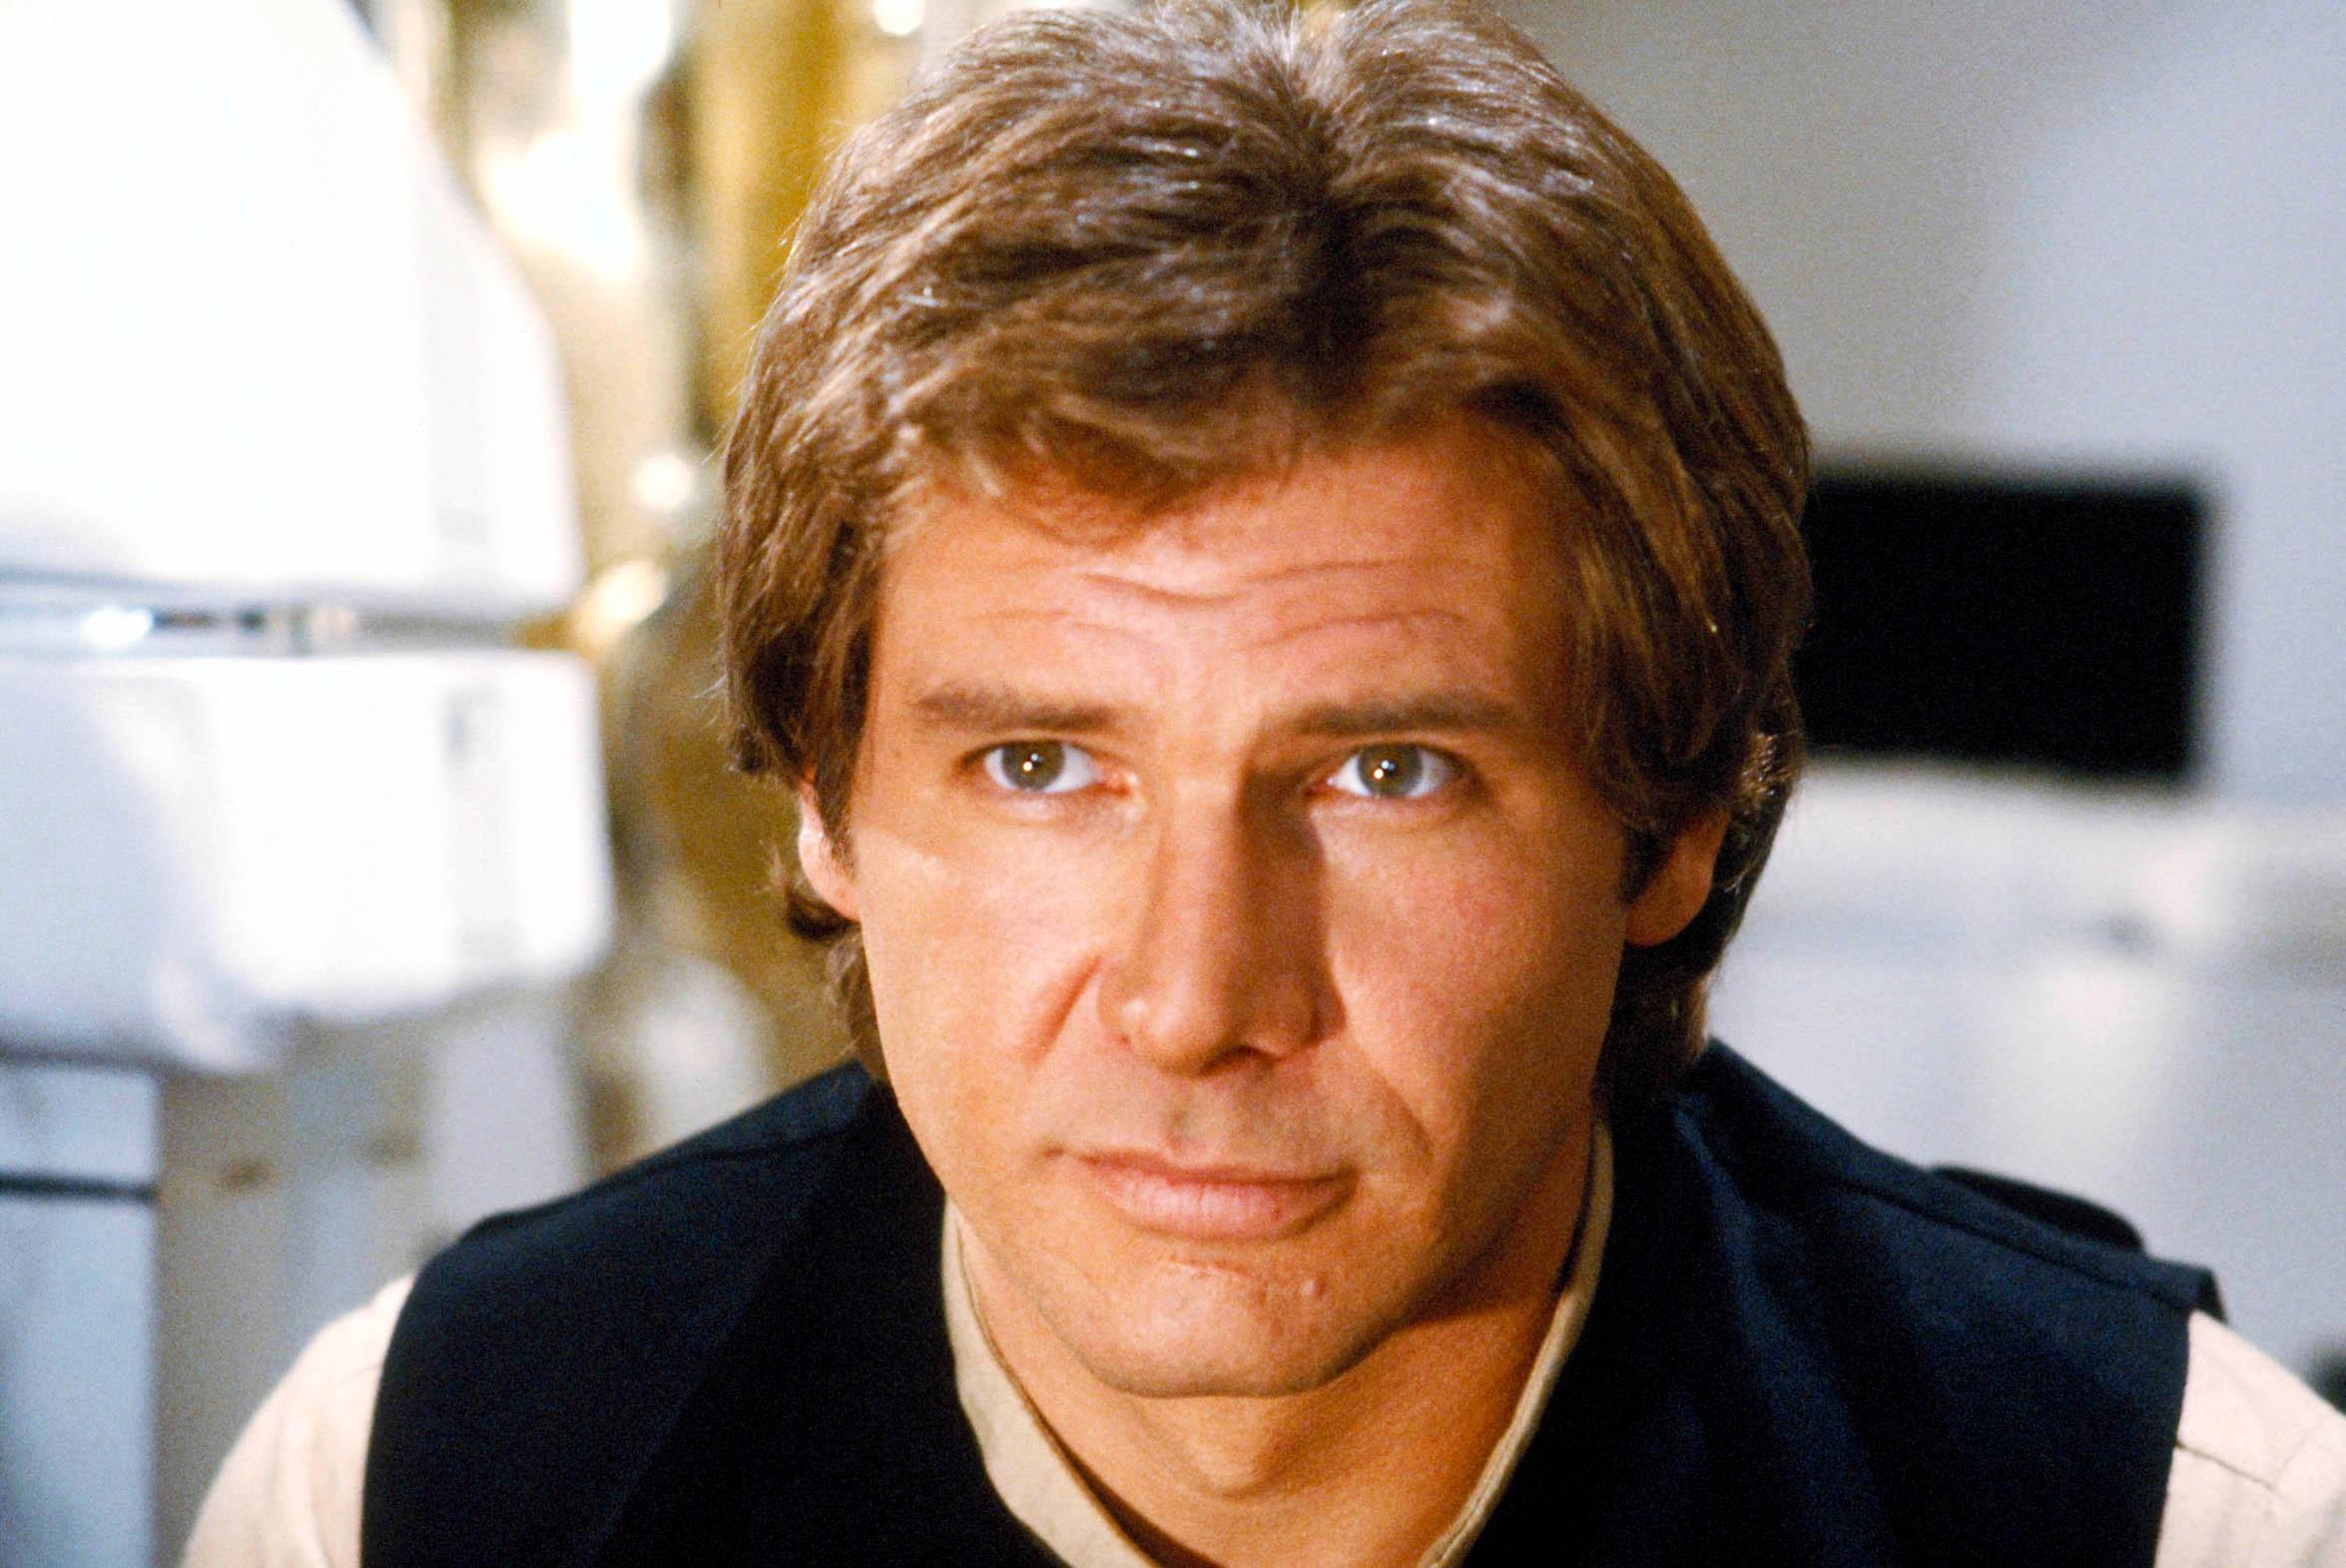 Star Wars Episode VI Return Of The Jedi starring Harrison Ford as Han Solo Lucas Films, Sky pics, TL